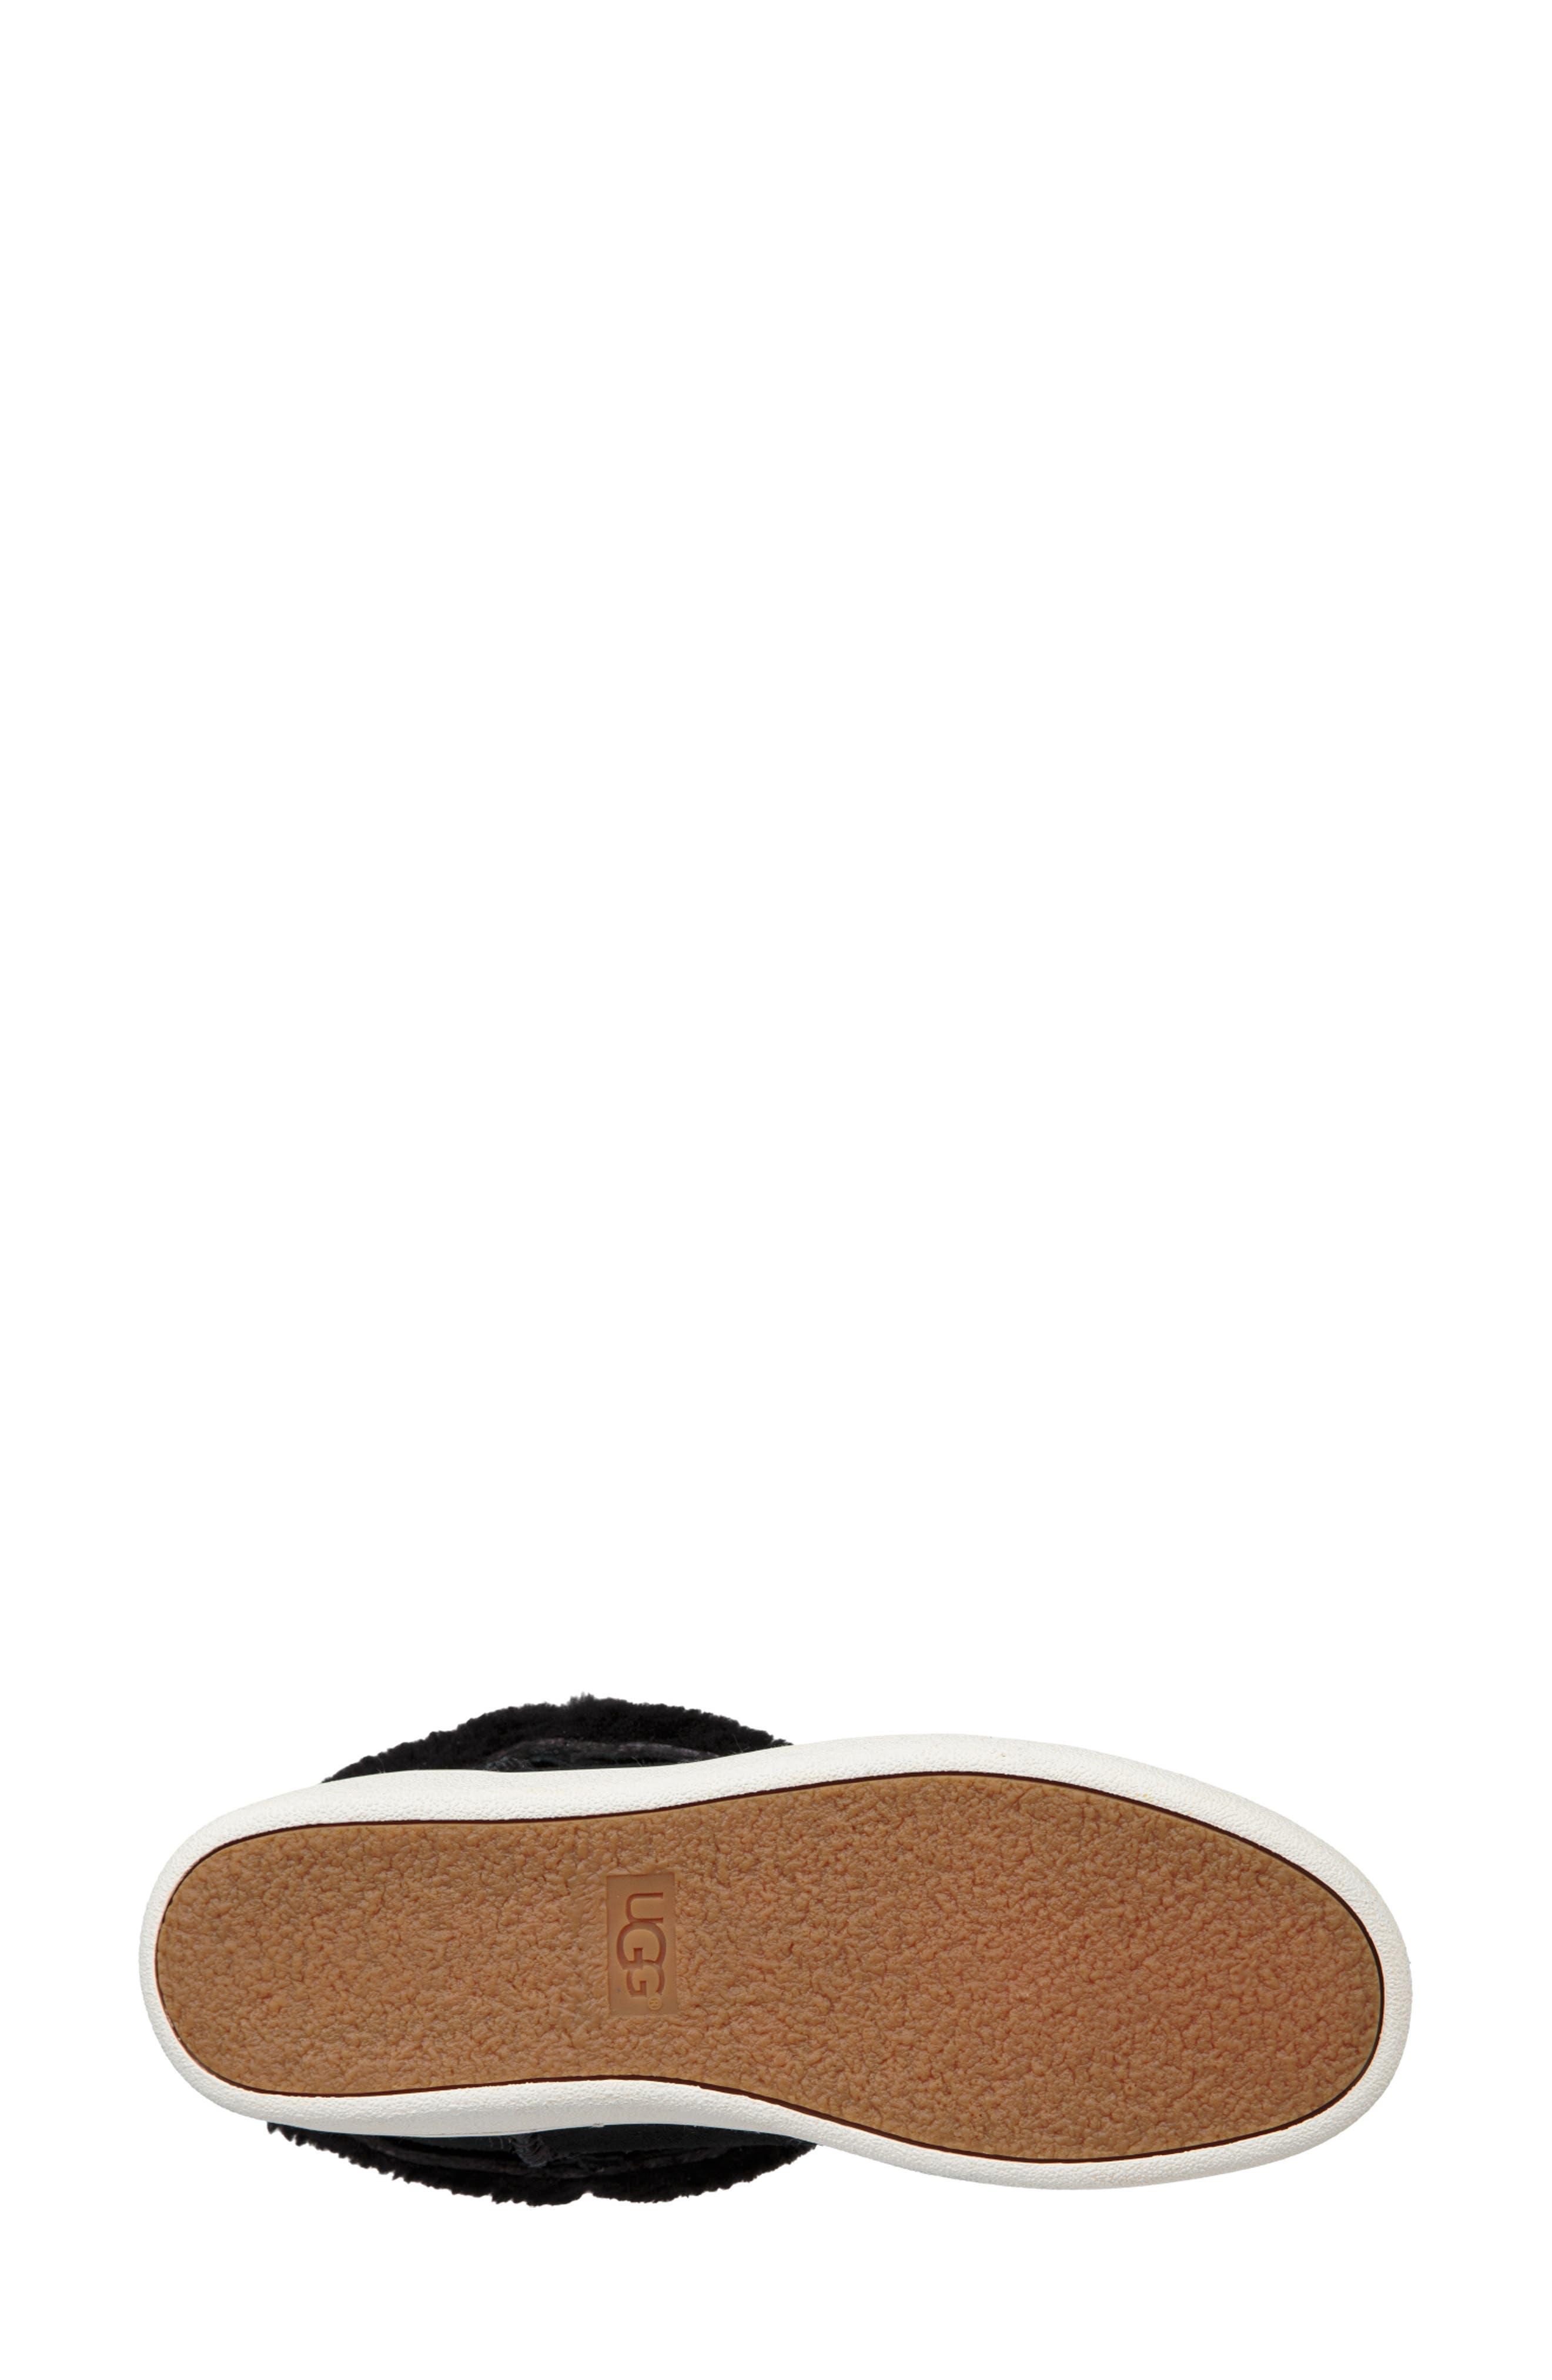 Mika Classic Genuine Shearling Sneaker,                             Alternate thumbnail 6, color,                             BLACK